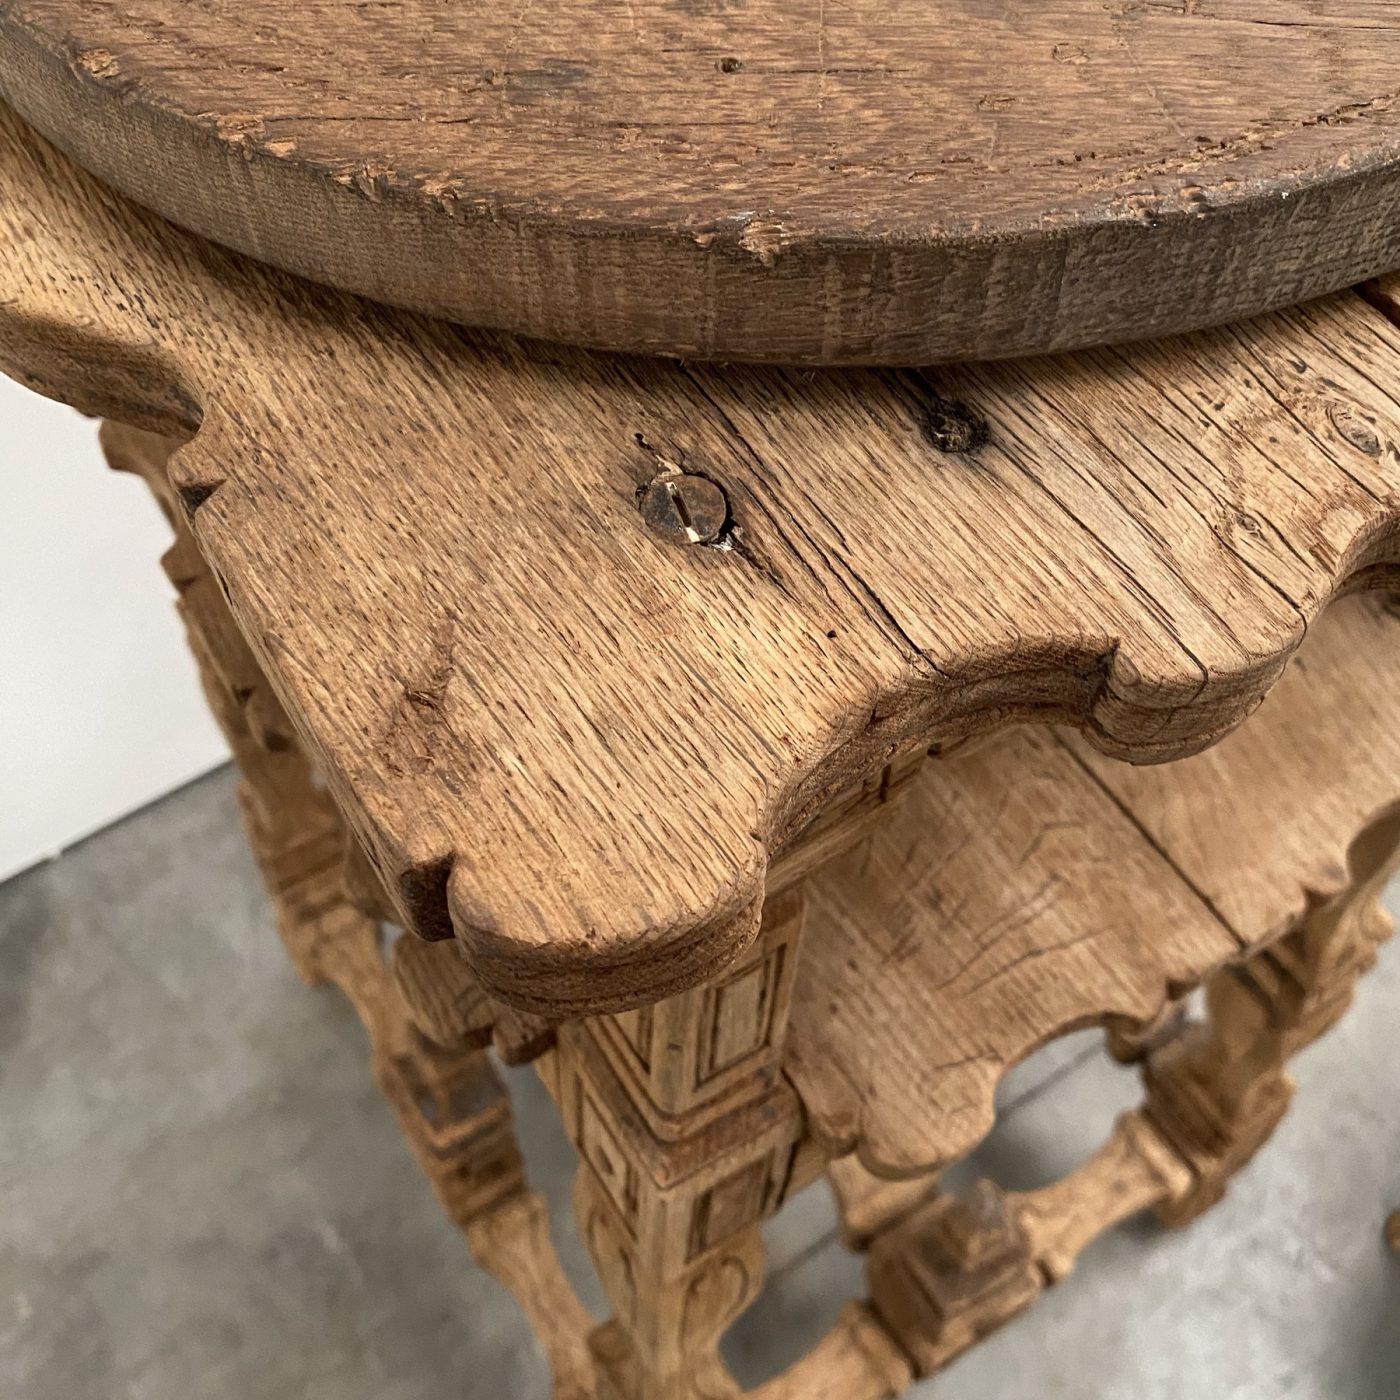 objet-vagabond-sculptor-table0002